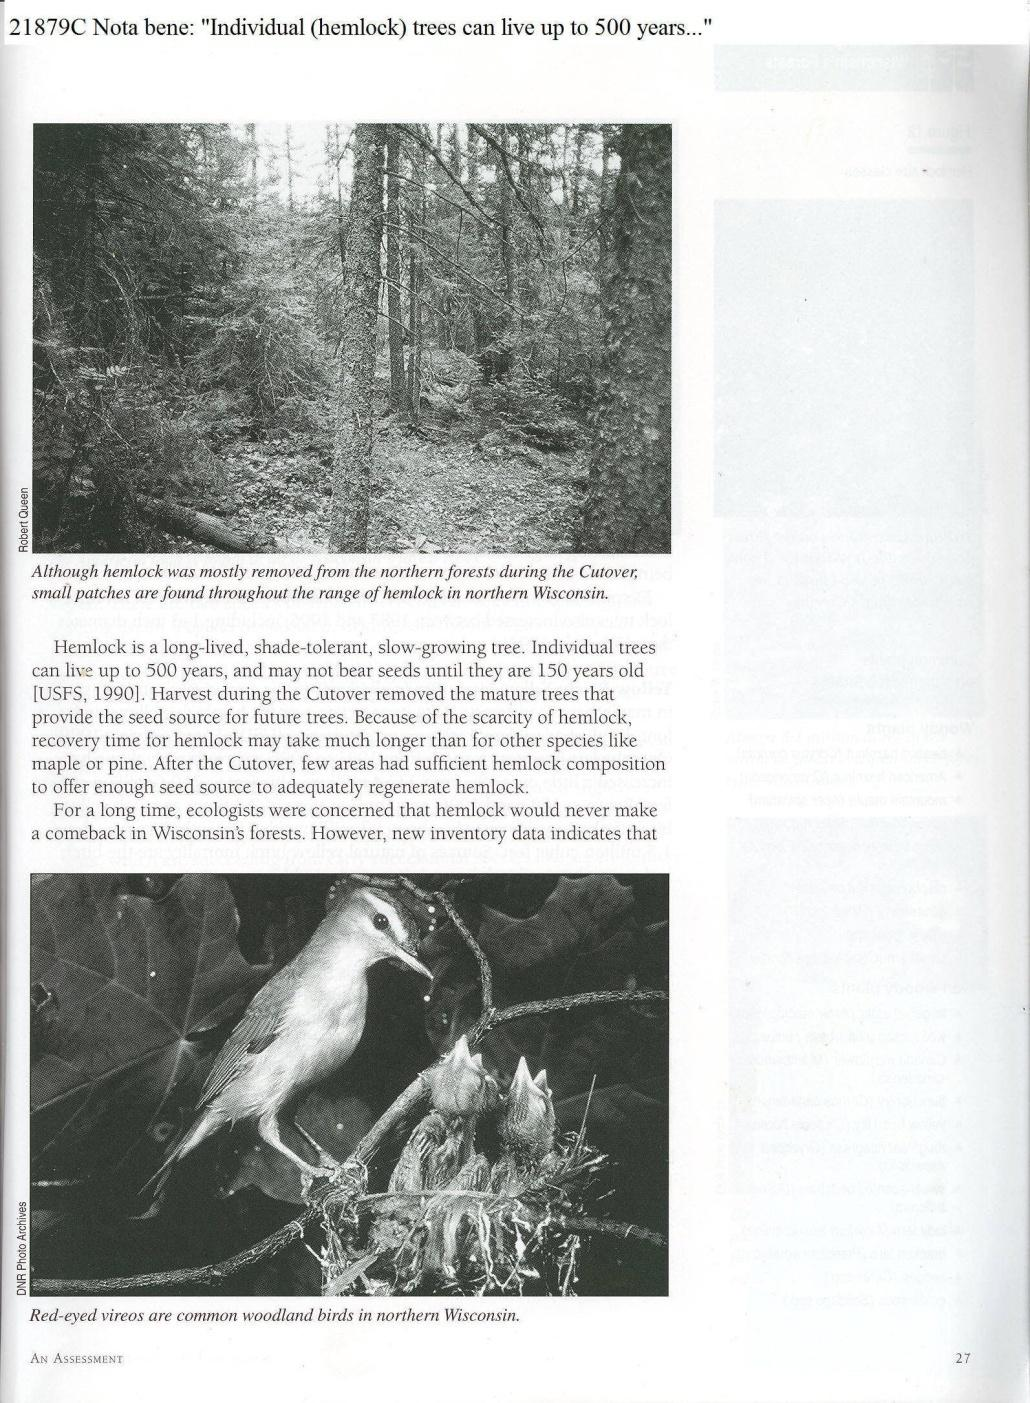 C:\Users\Robert P. Rusch\Desktop\II. RLHSoc\Documents & Photos-Scanned\Rib Lake History 21800-21899\21879C ibid p. 27 …hemlock can live up to 500 years.jpg